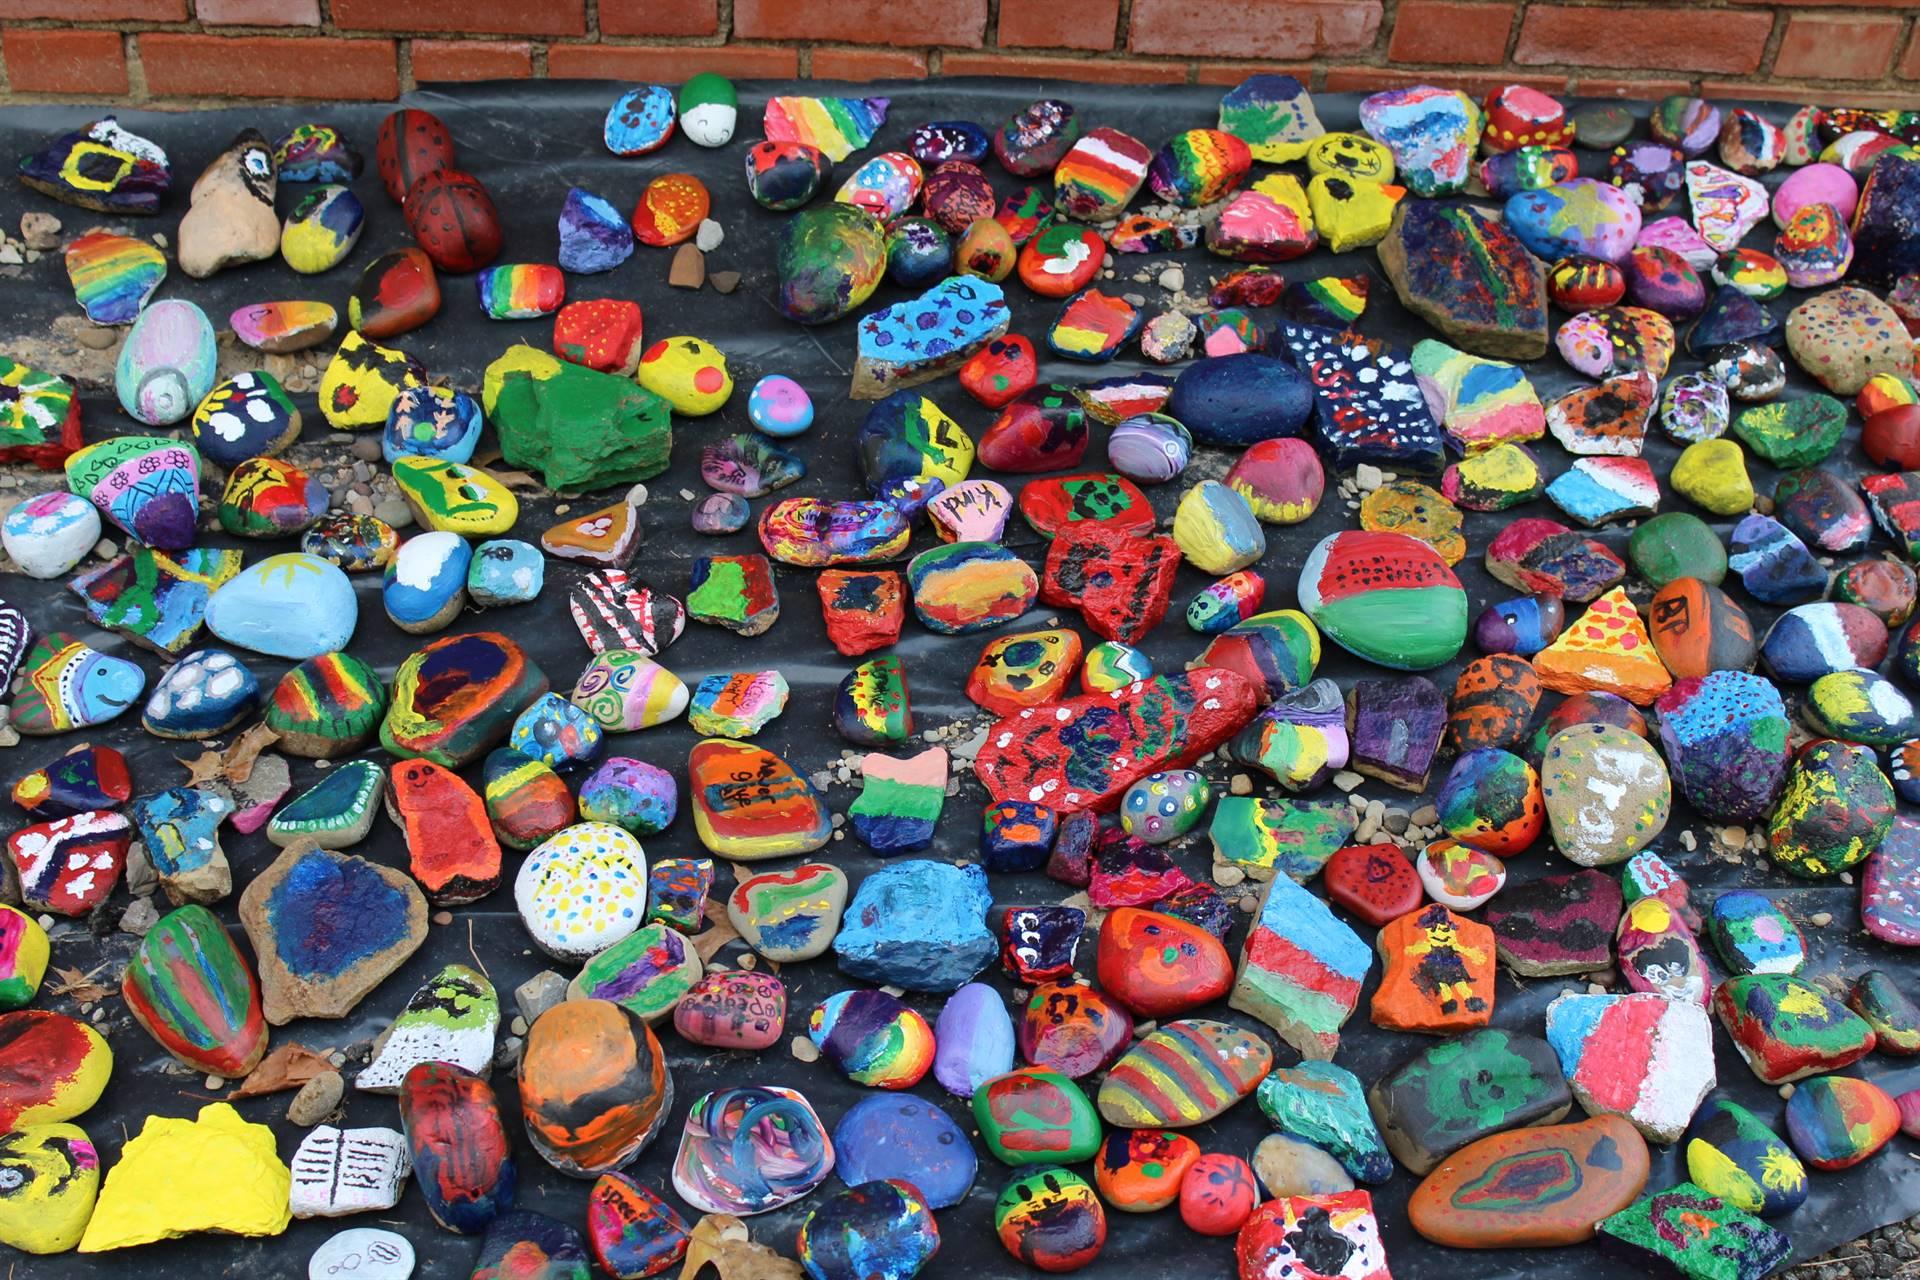 The rocks in the rock garden